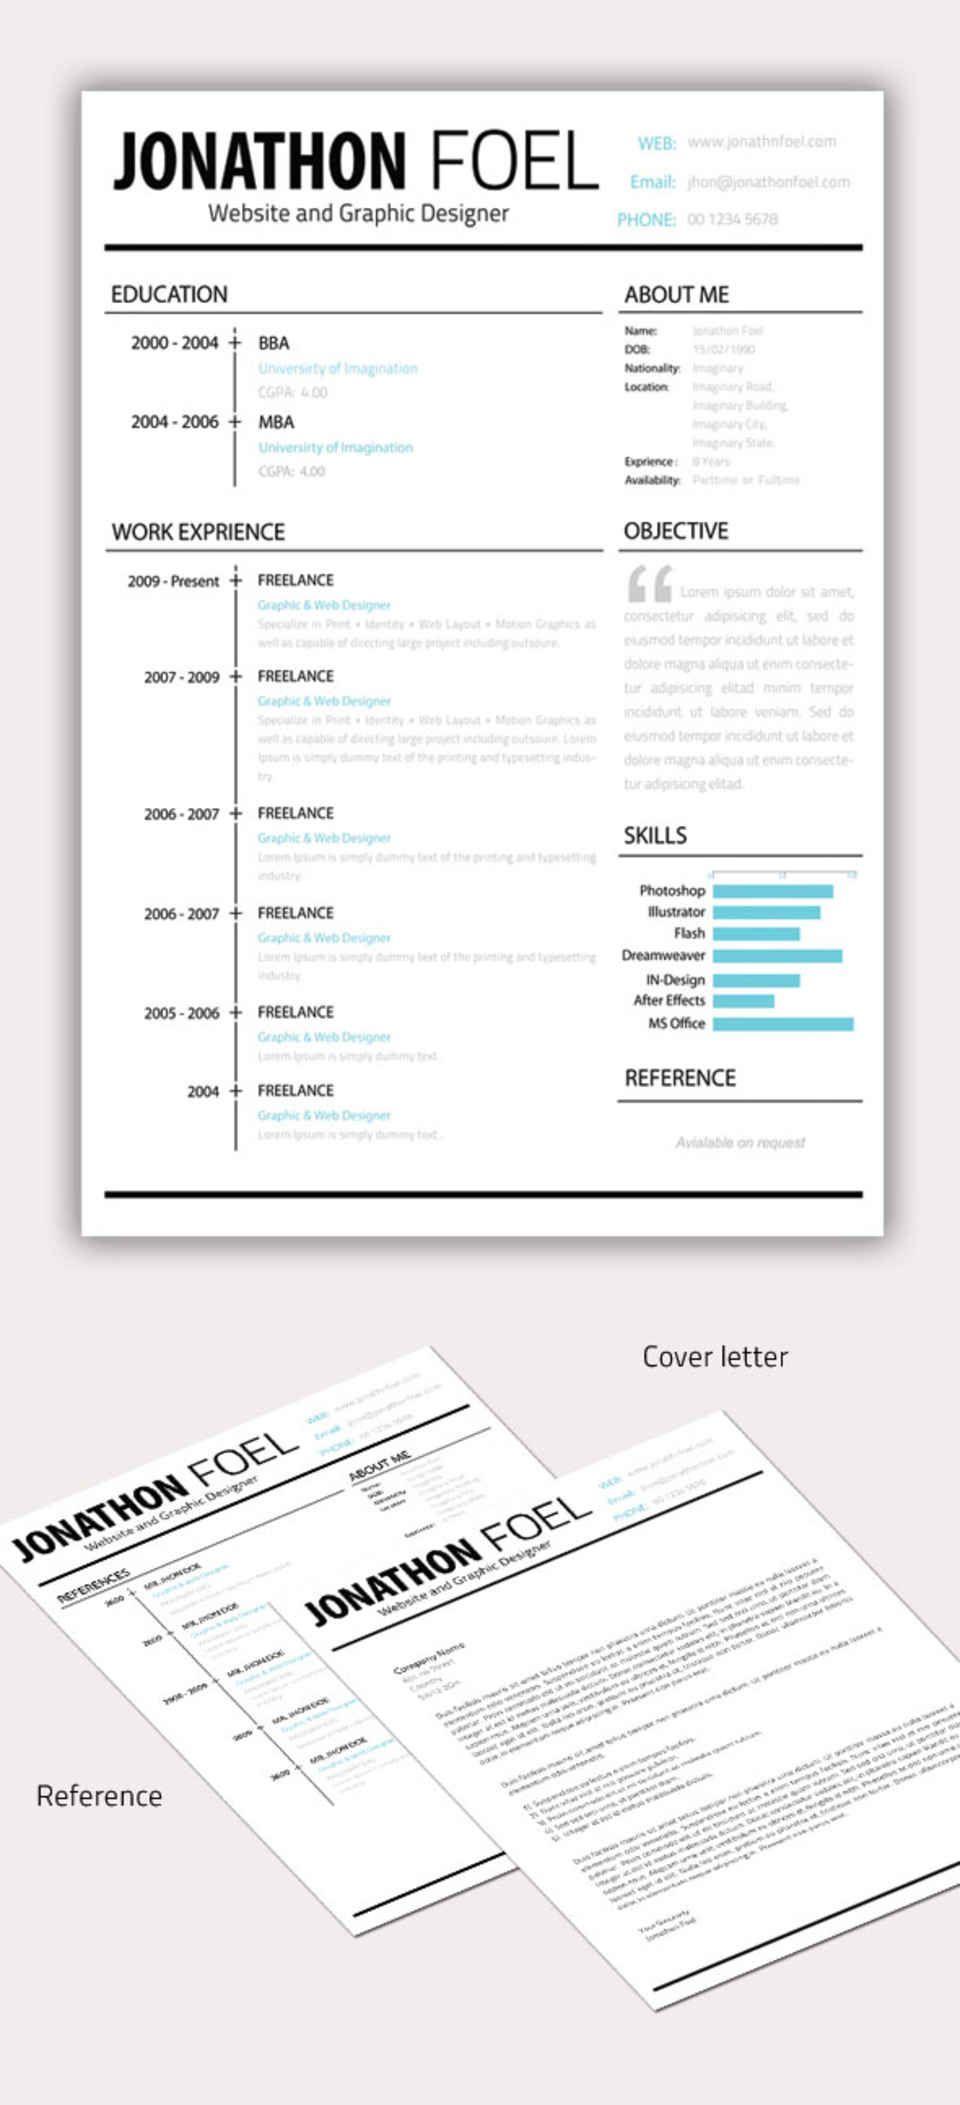 Minimal Resume Cv Template Psd Download Graphic Resume Lettering Cv Design Template